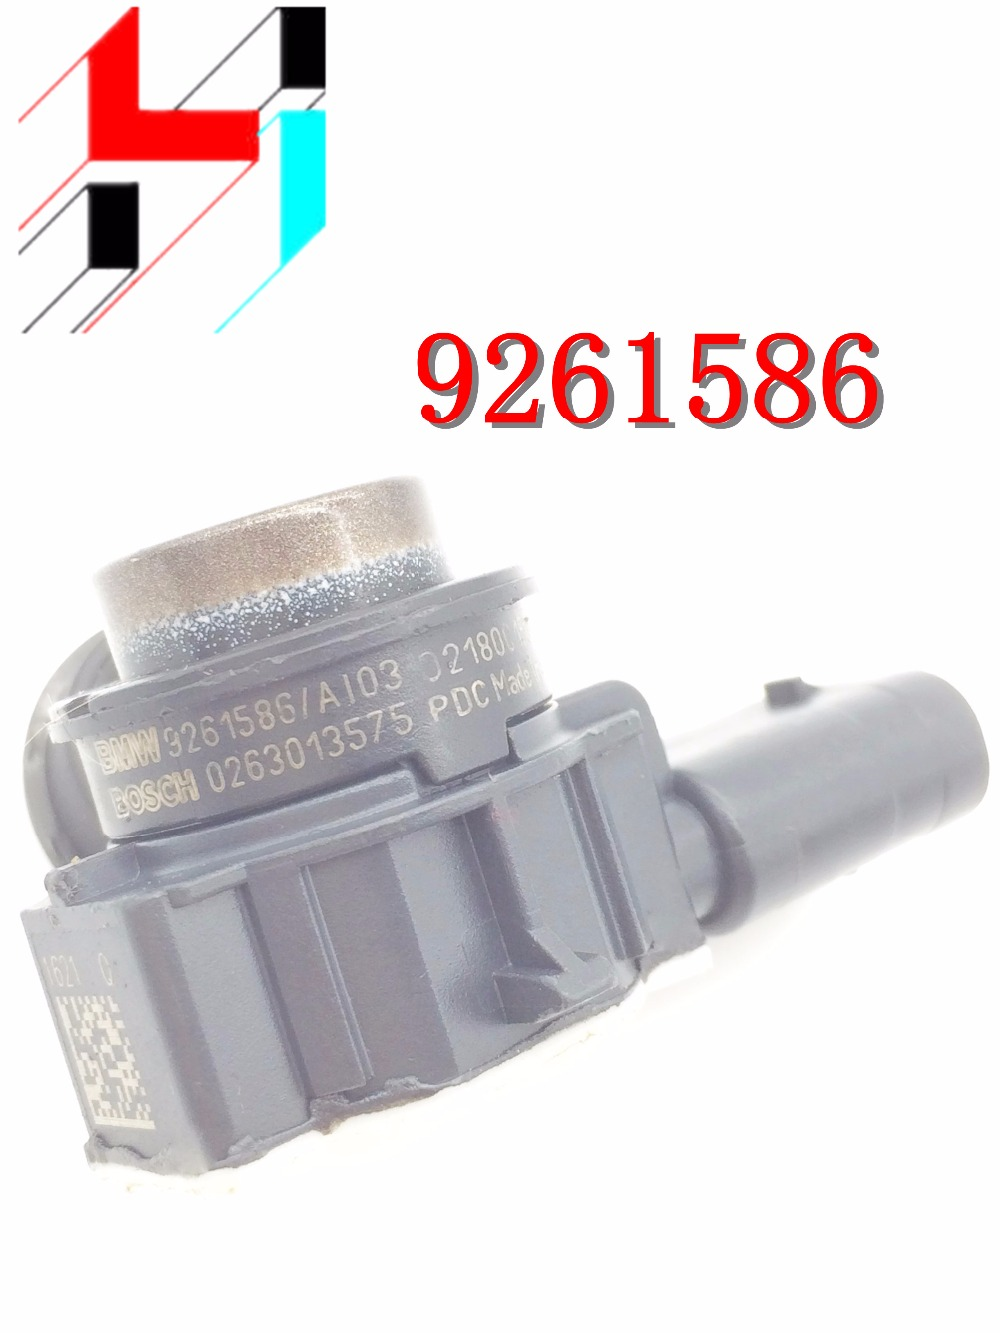 (10pcs) 66209261586 Original 9261586 Parking Sensor Pdc Sensor Parking Distance Control Sensor 0263033275 For Bmw Genuine Relieving Rheumatism